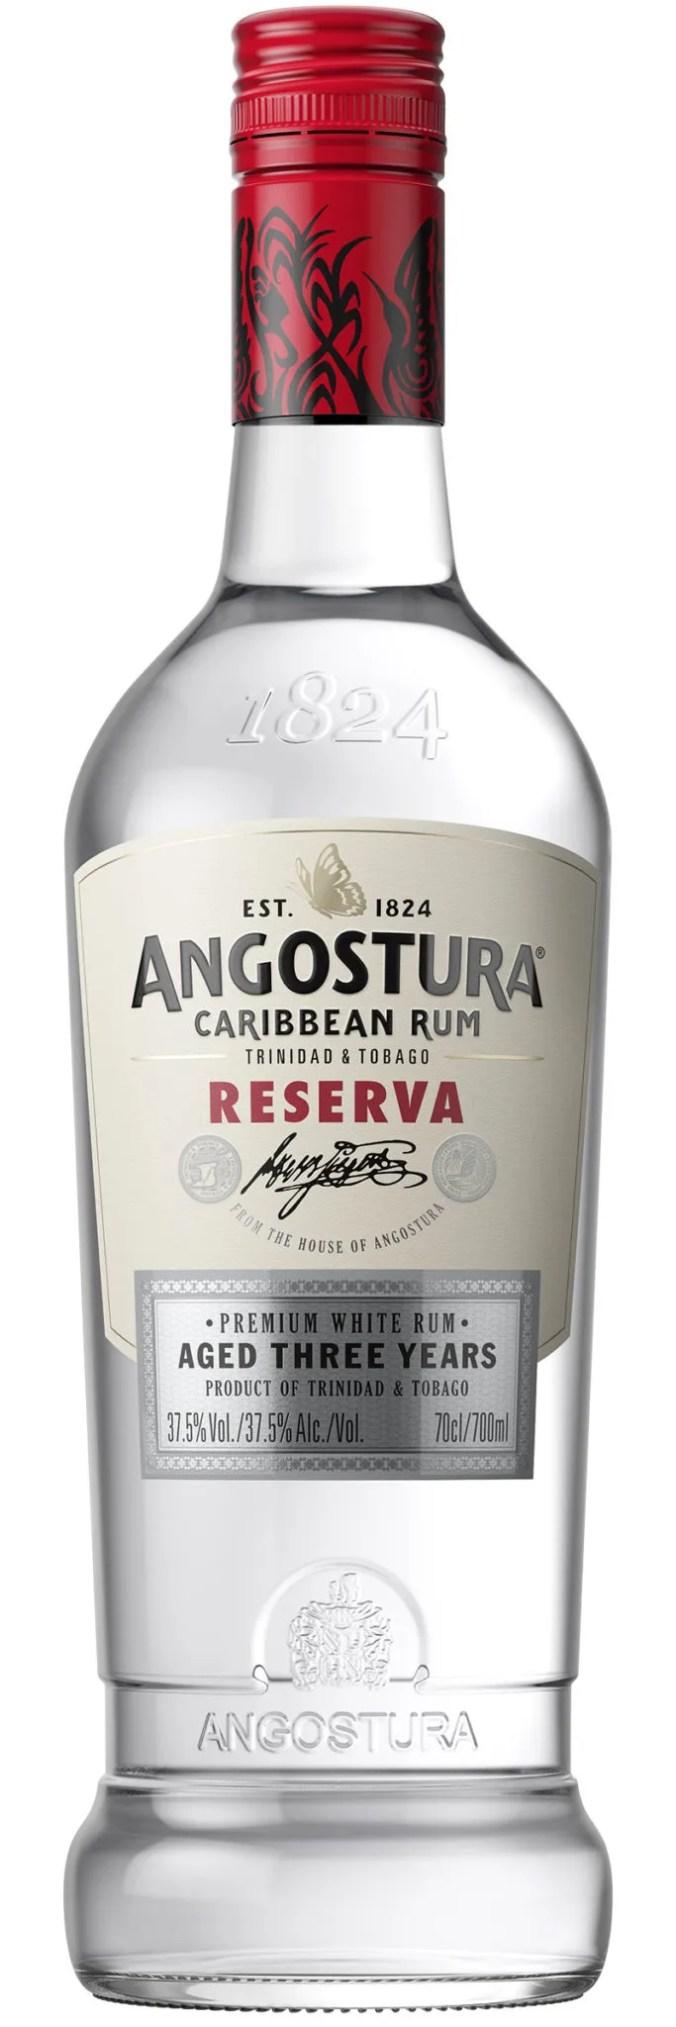 Angostura Reserva white rum from Trinidad